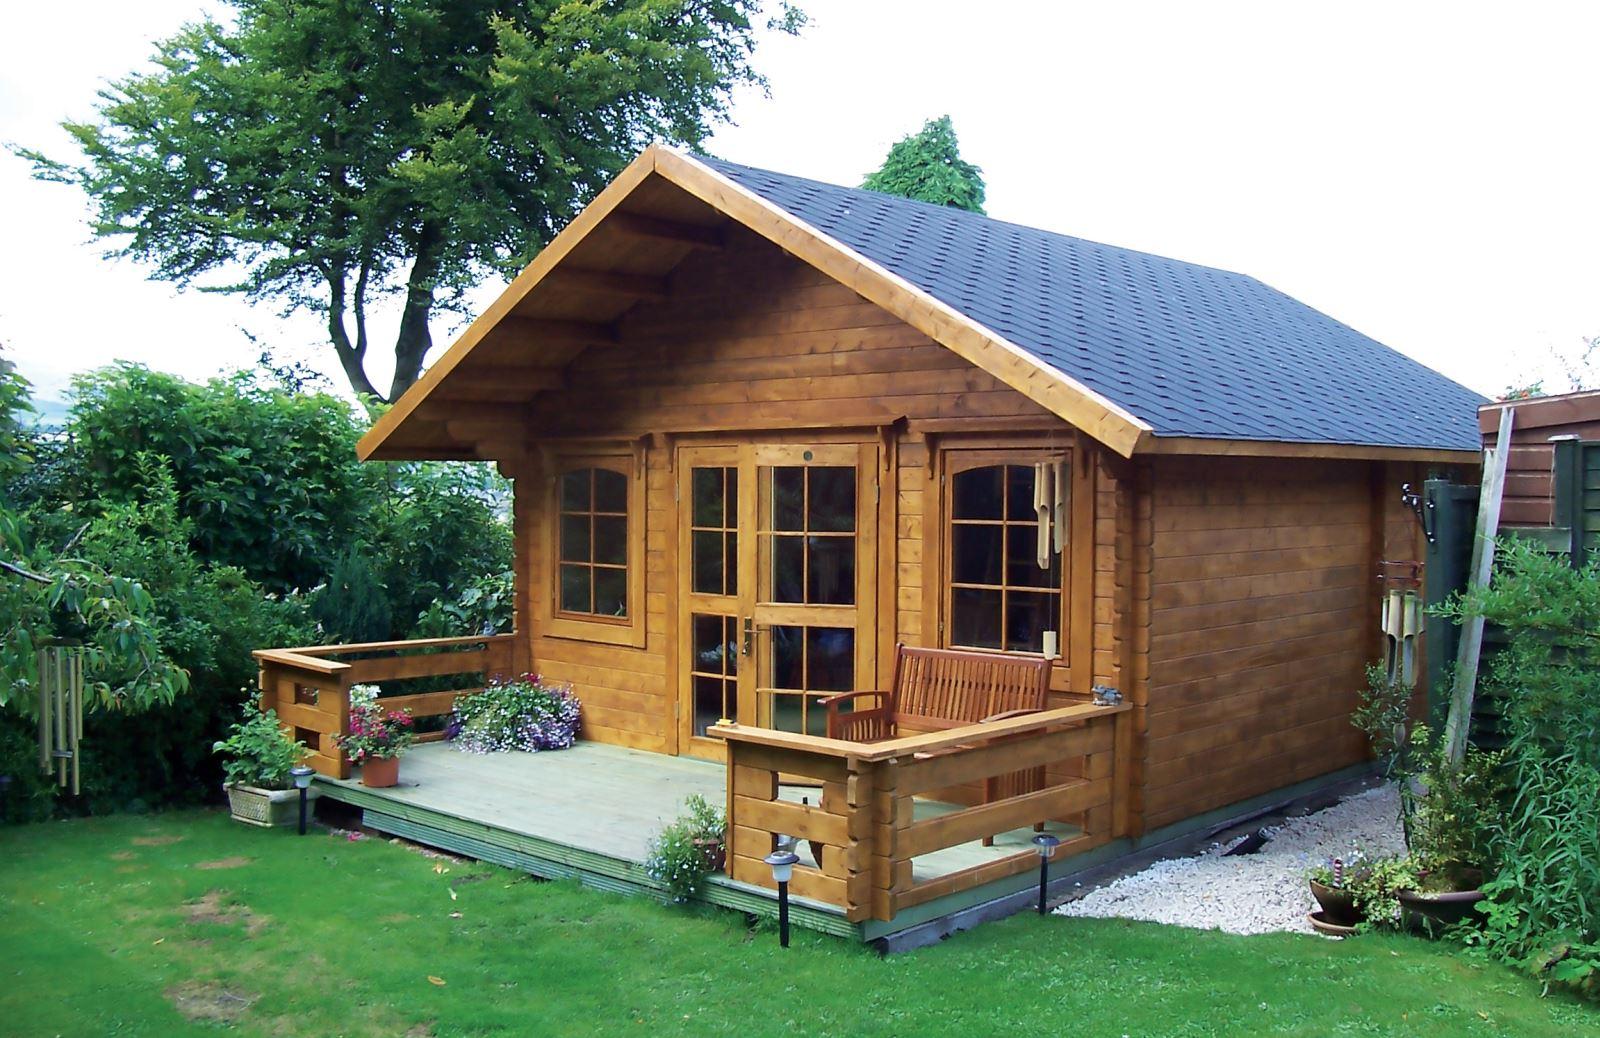 Lillevilla Kajaani Log Cabin